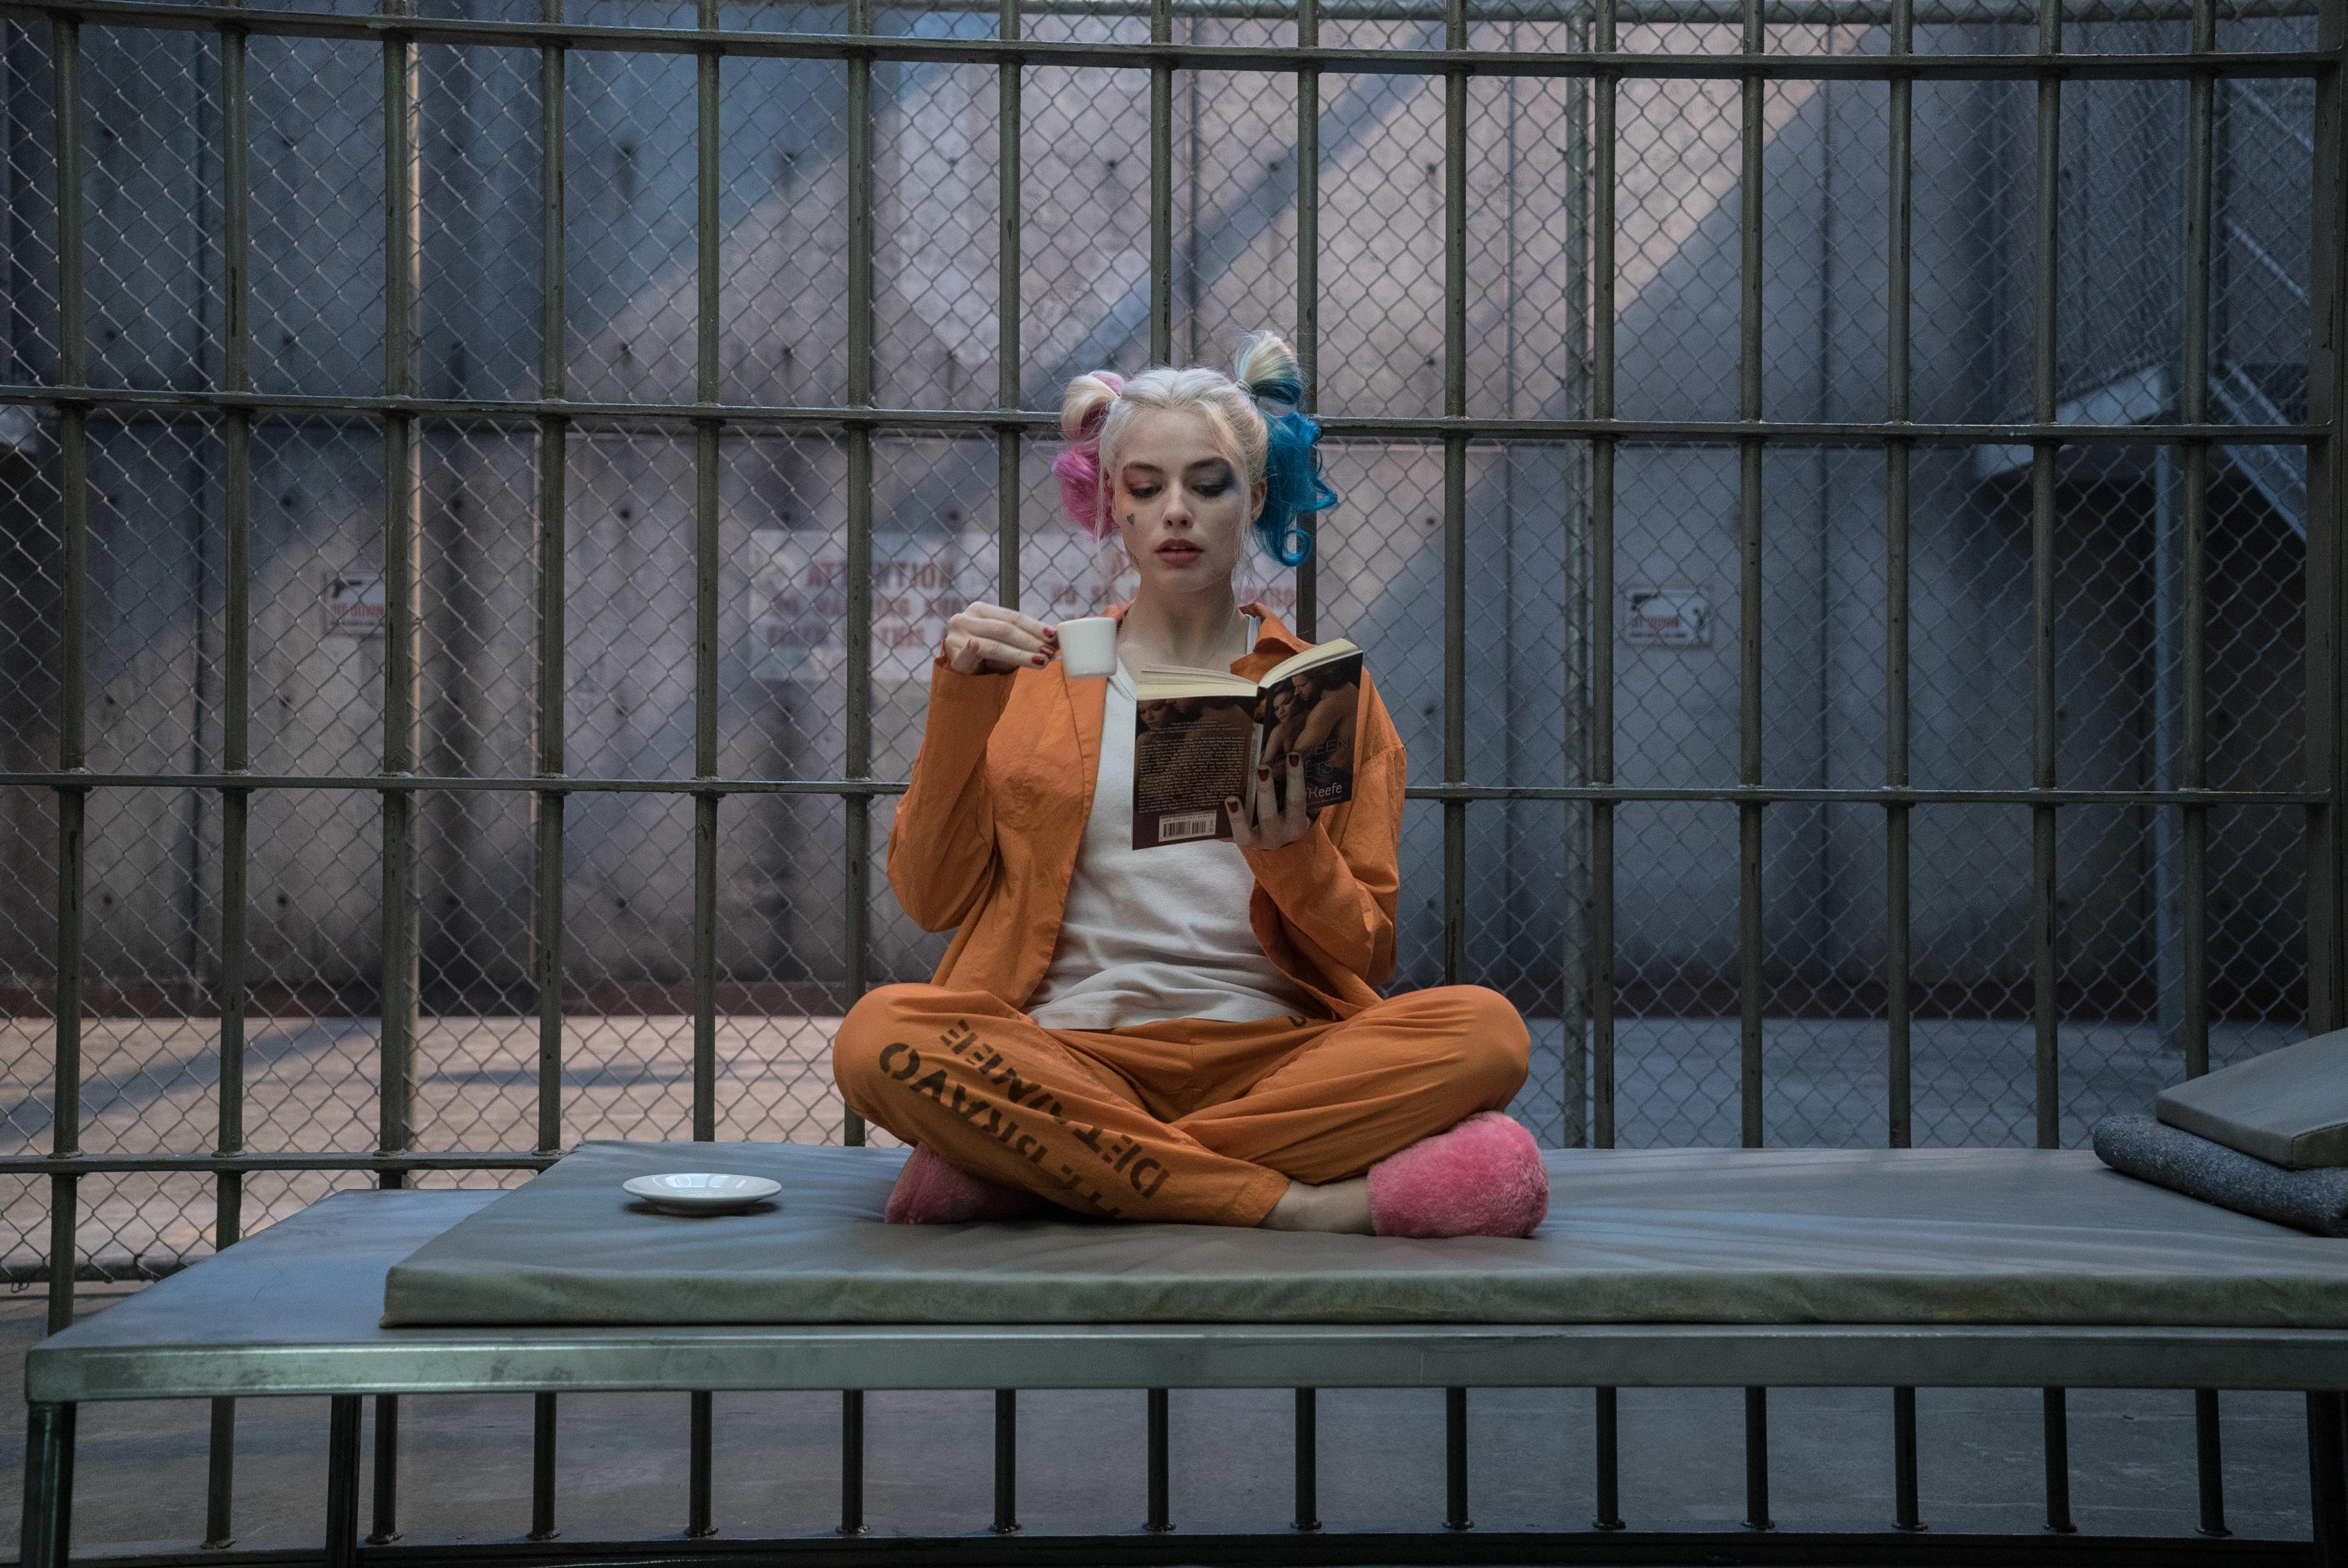 Harley Quinn (Margot Robbie) incarcerated at Belle Reve.